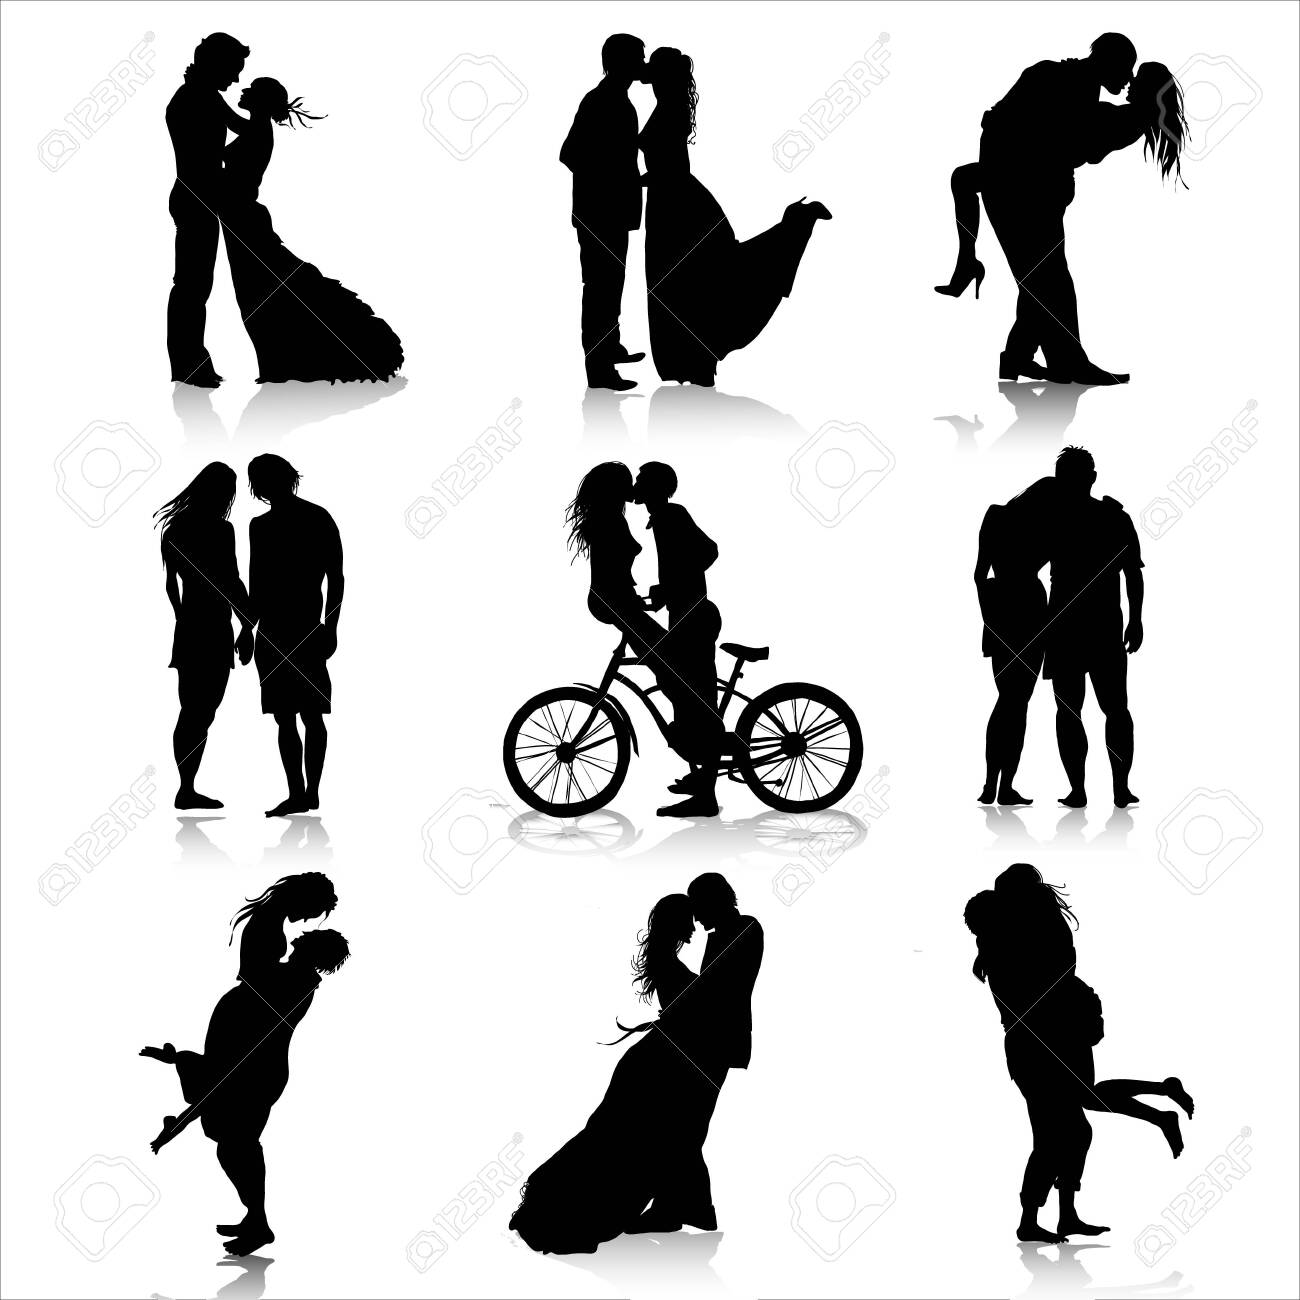 Romantic couples silhouettes. Love couple - 149548859